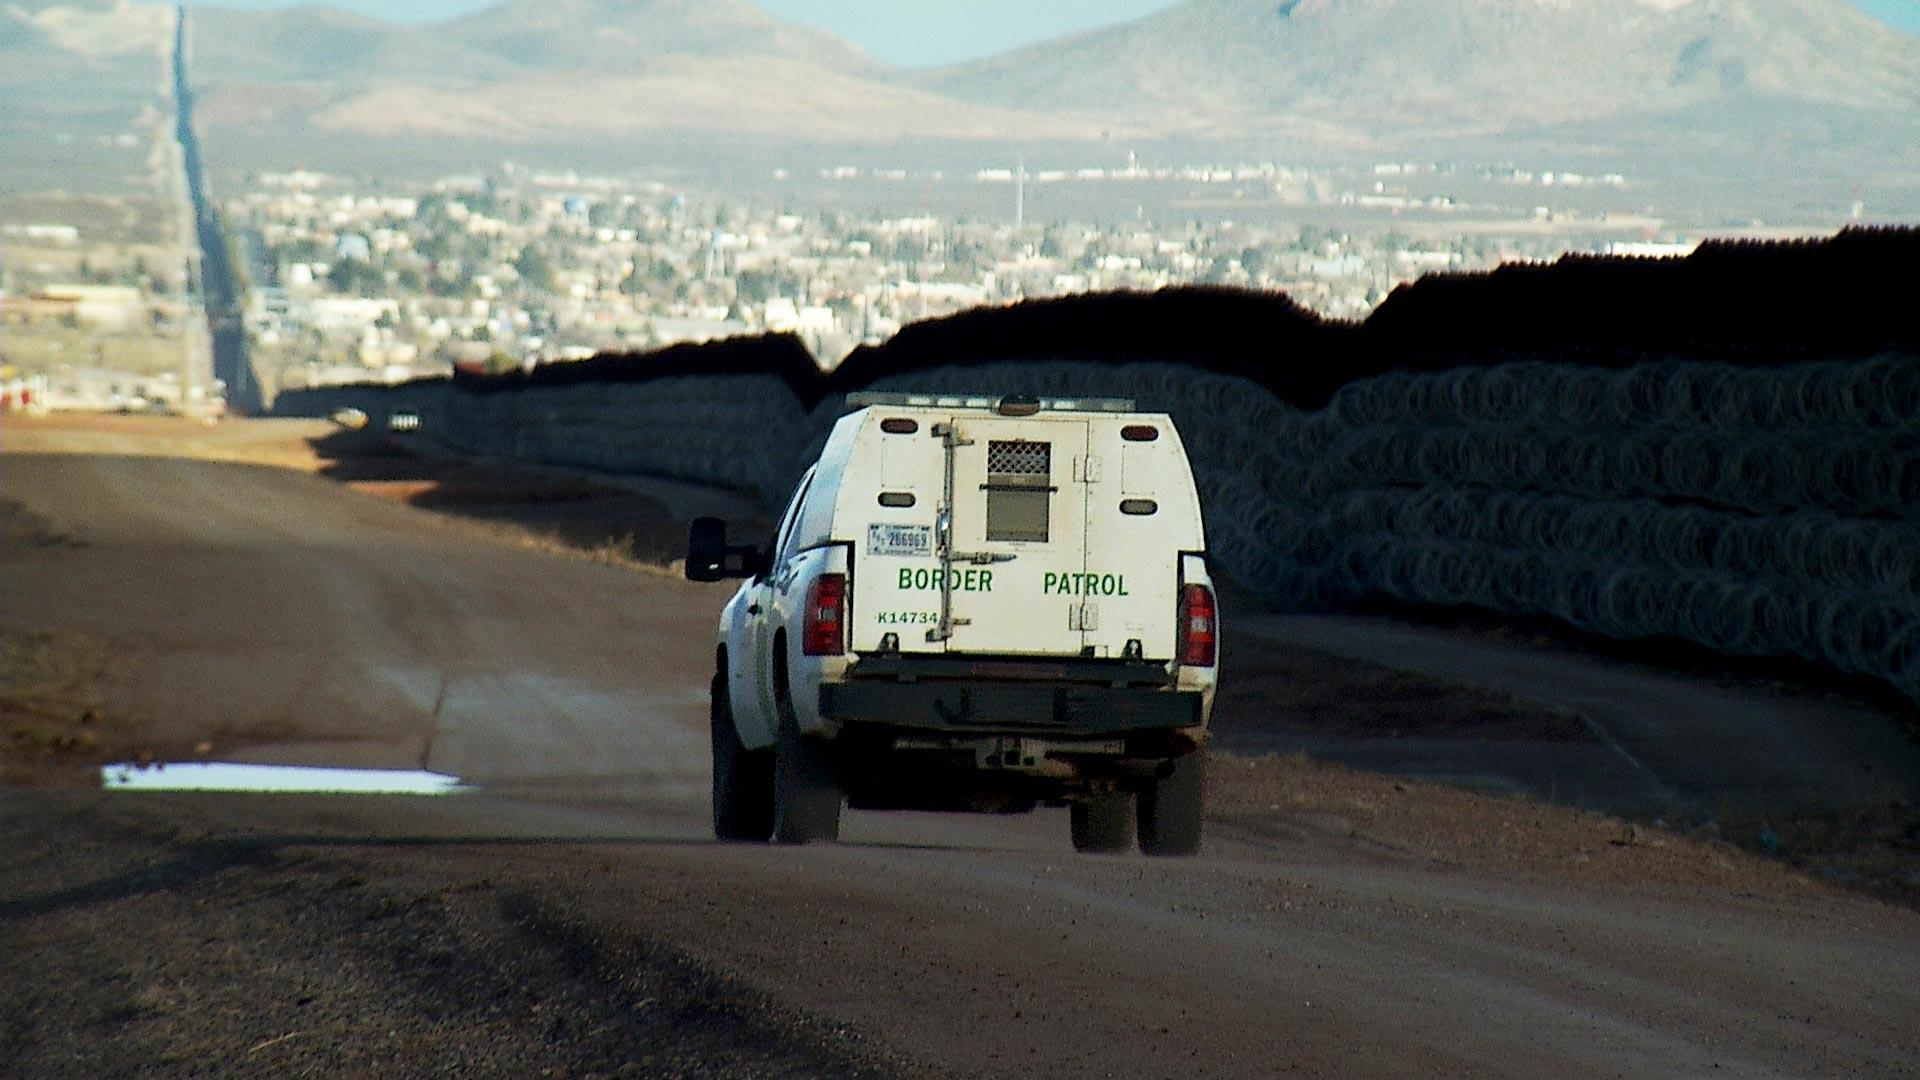 A border patrol vehicle drives along the border wall in Douglas, Ariz. January 2021.